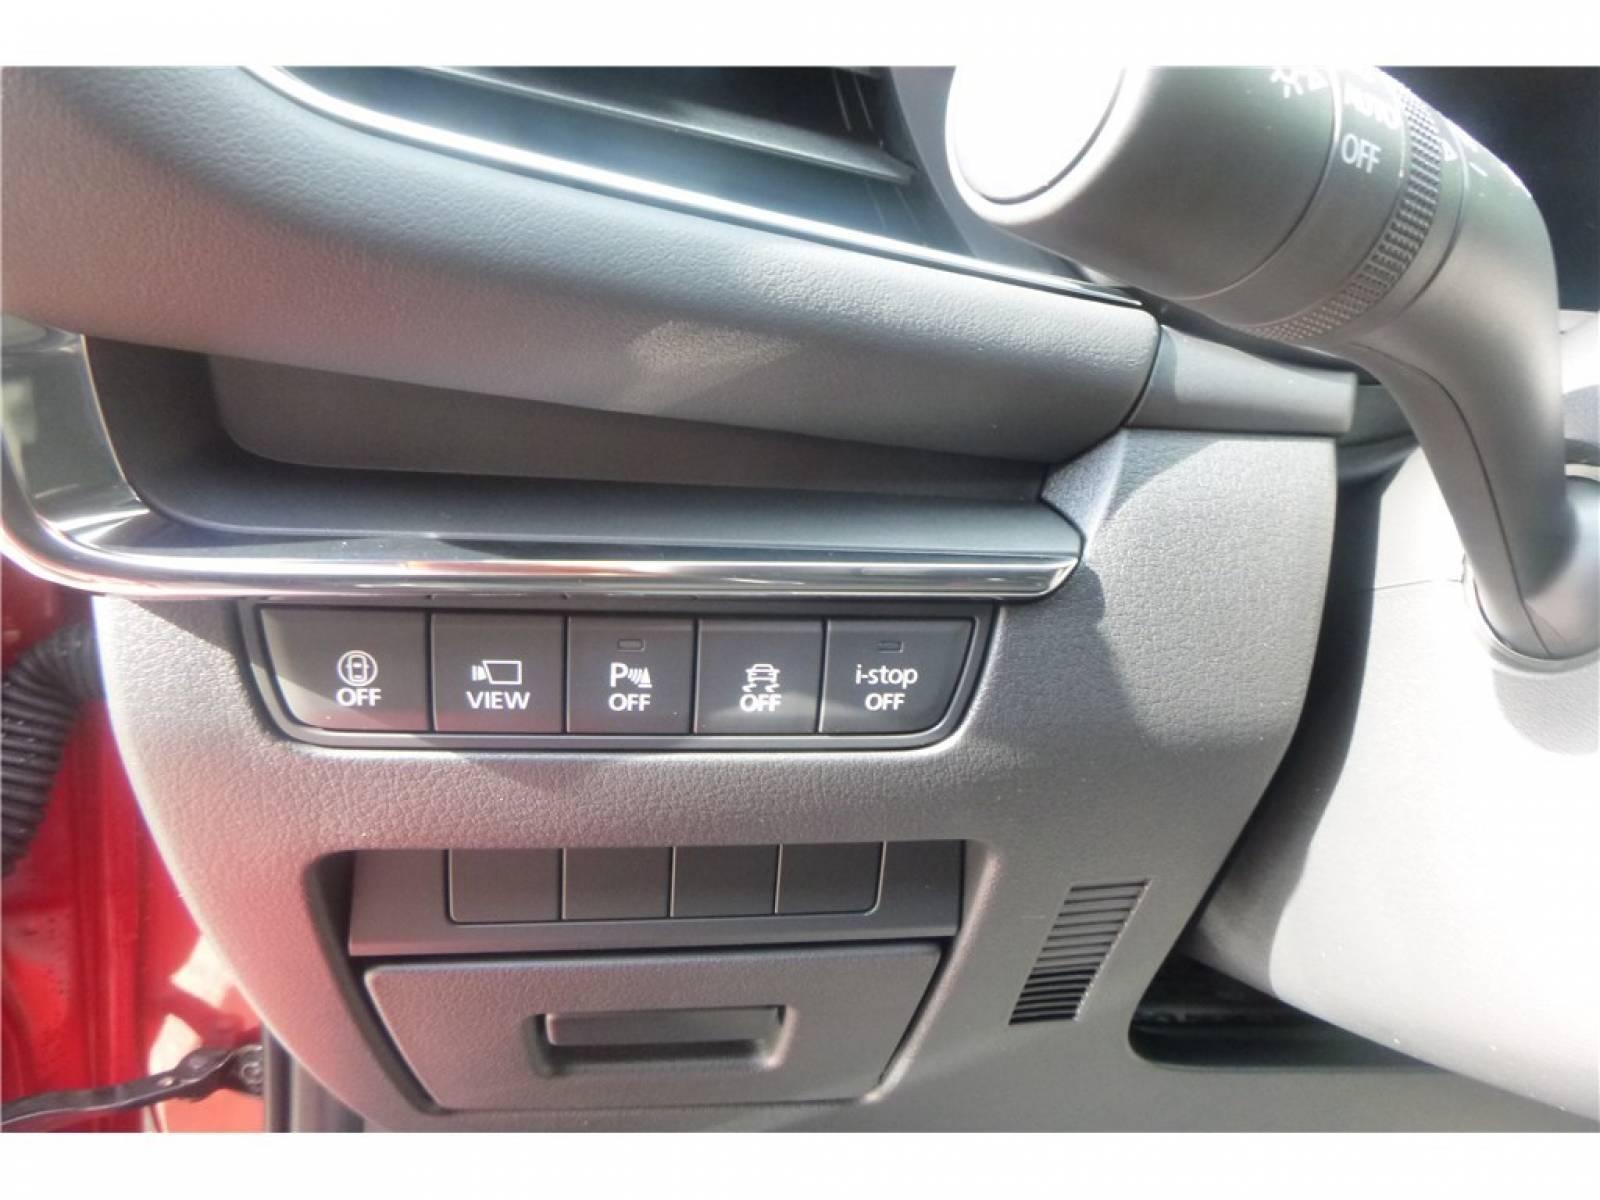 MAZDA Mazda3 5 portes 2.0L e-SKYACTIV-G M Hybrid 122 ch BVA6 - véhicule d'occasion - Groupe Guillet - Chalon Automobiles - 71100 - Chalon-sur-Saône - 13